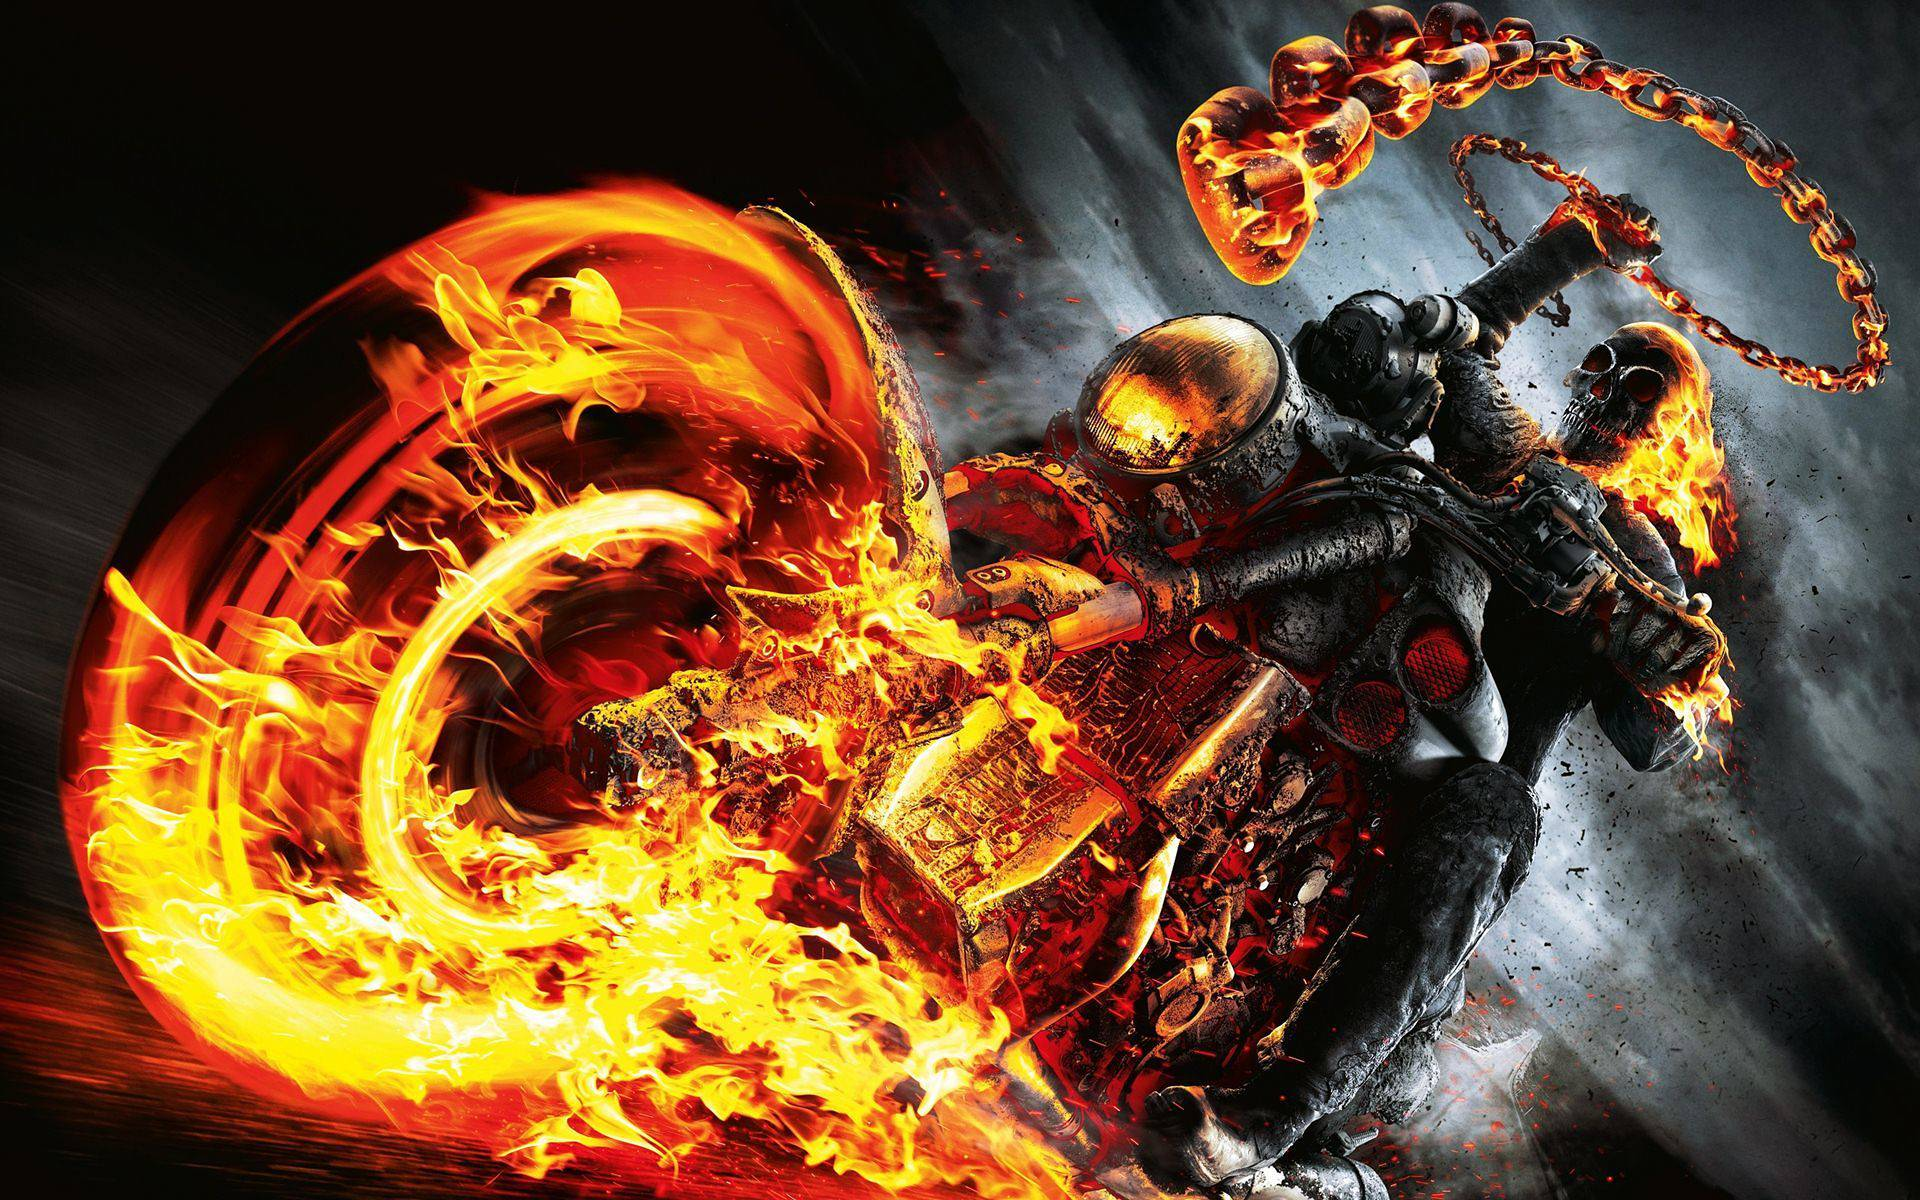 Gost rider image